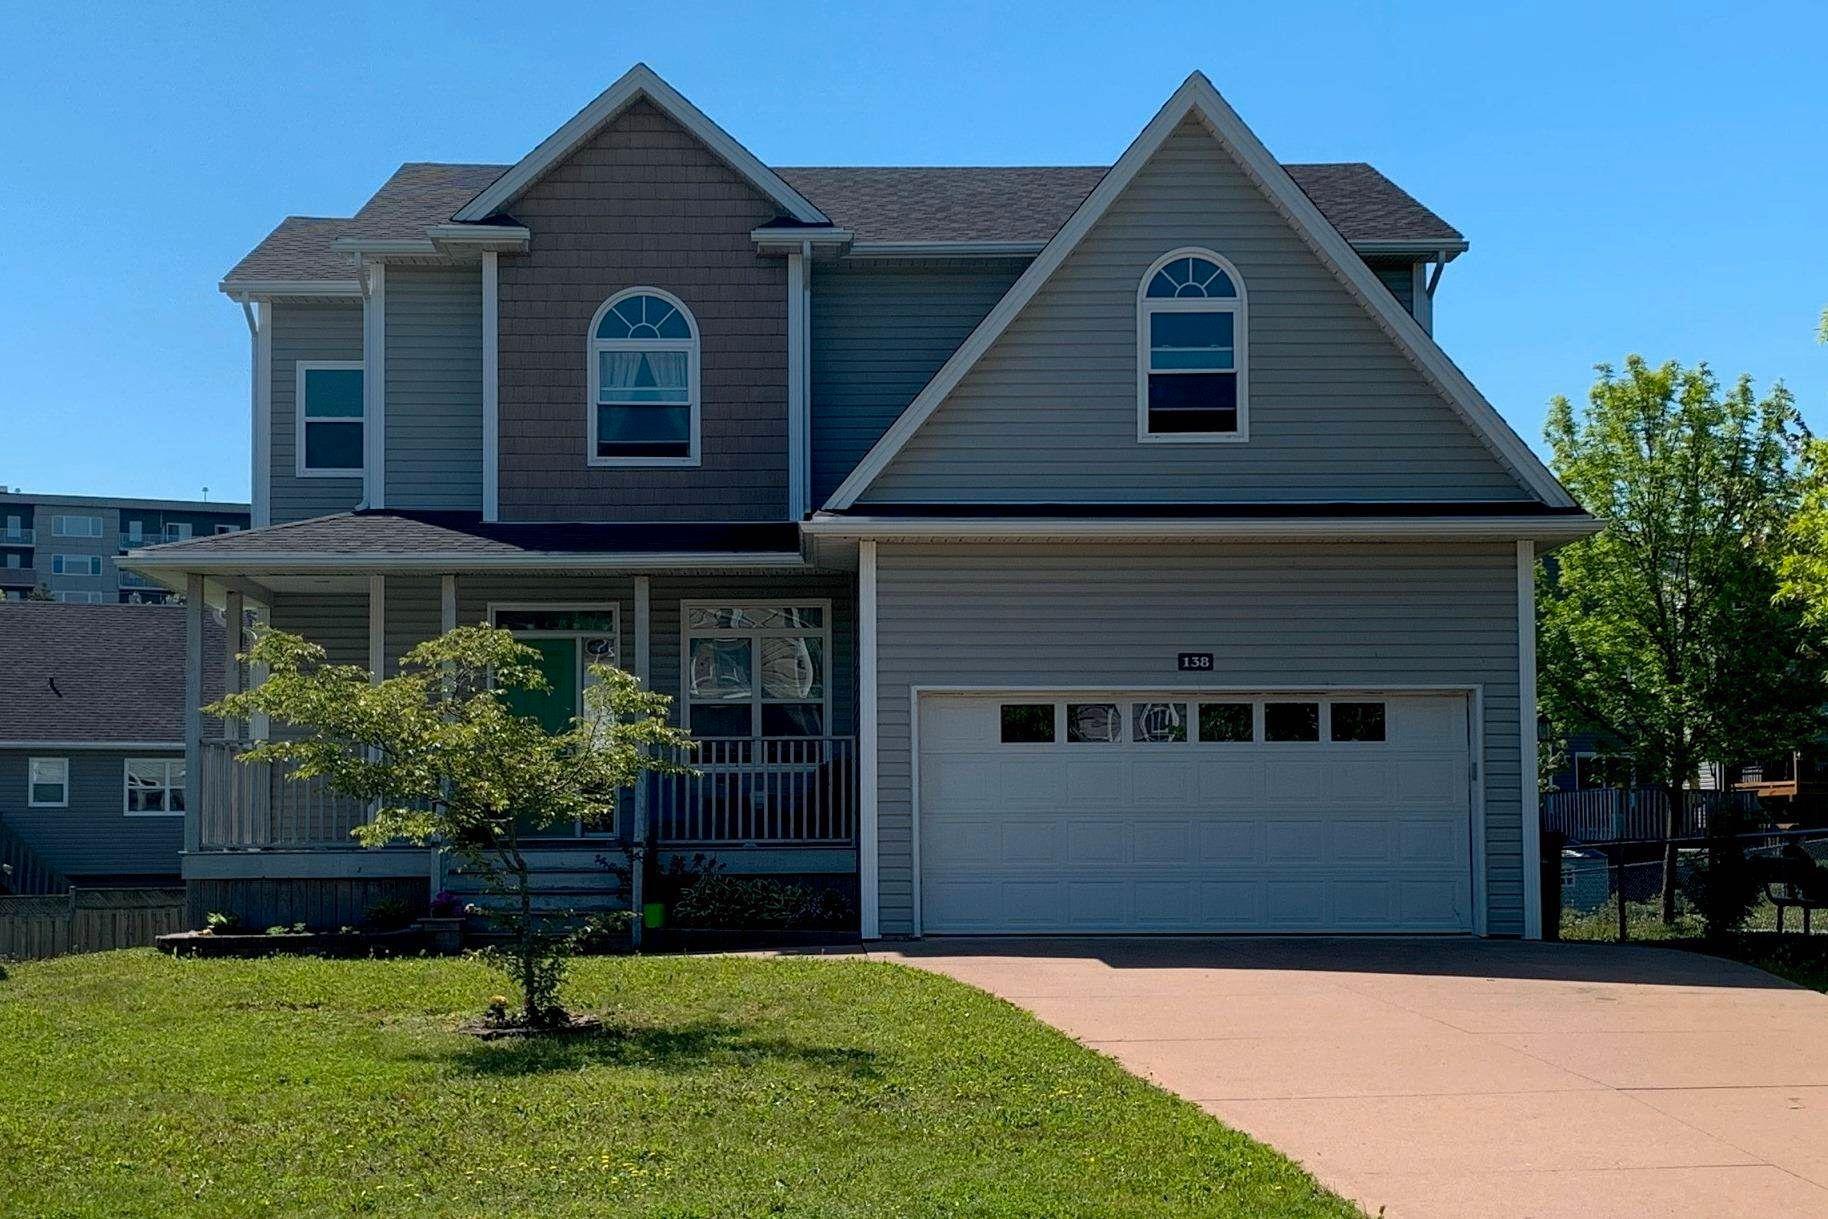 Main Photo: 138 Cannon Terrace in Dartmouth: 13-Crichton Park, Albro Lake Residential for sale (Halifax-Dartmouth)  : MLS®# 202113988